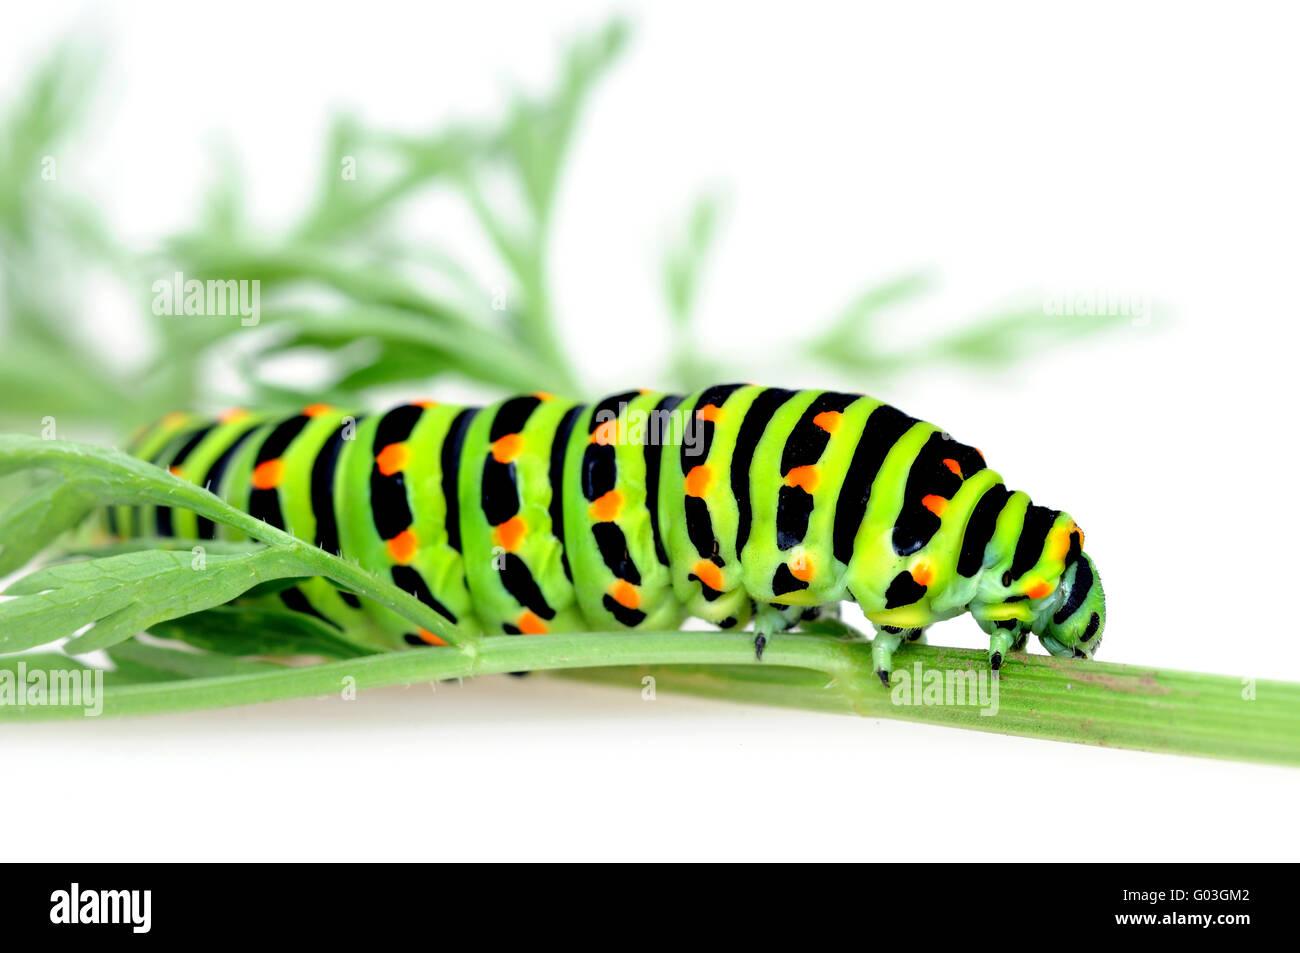 Schwalbenschwanz-Raupe / Swallowtail caterpillar Stock Photo